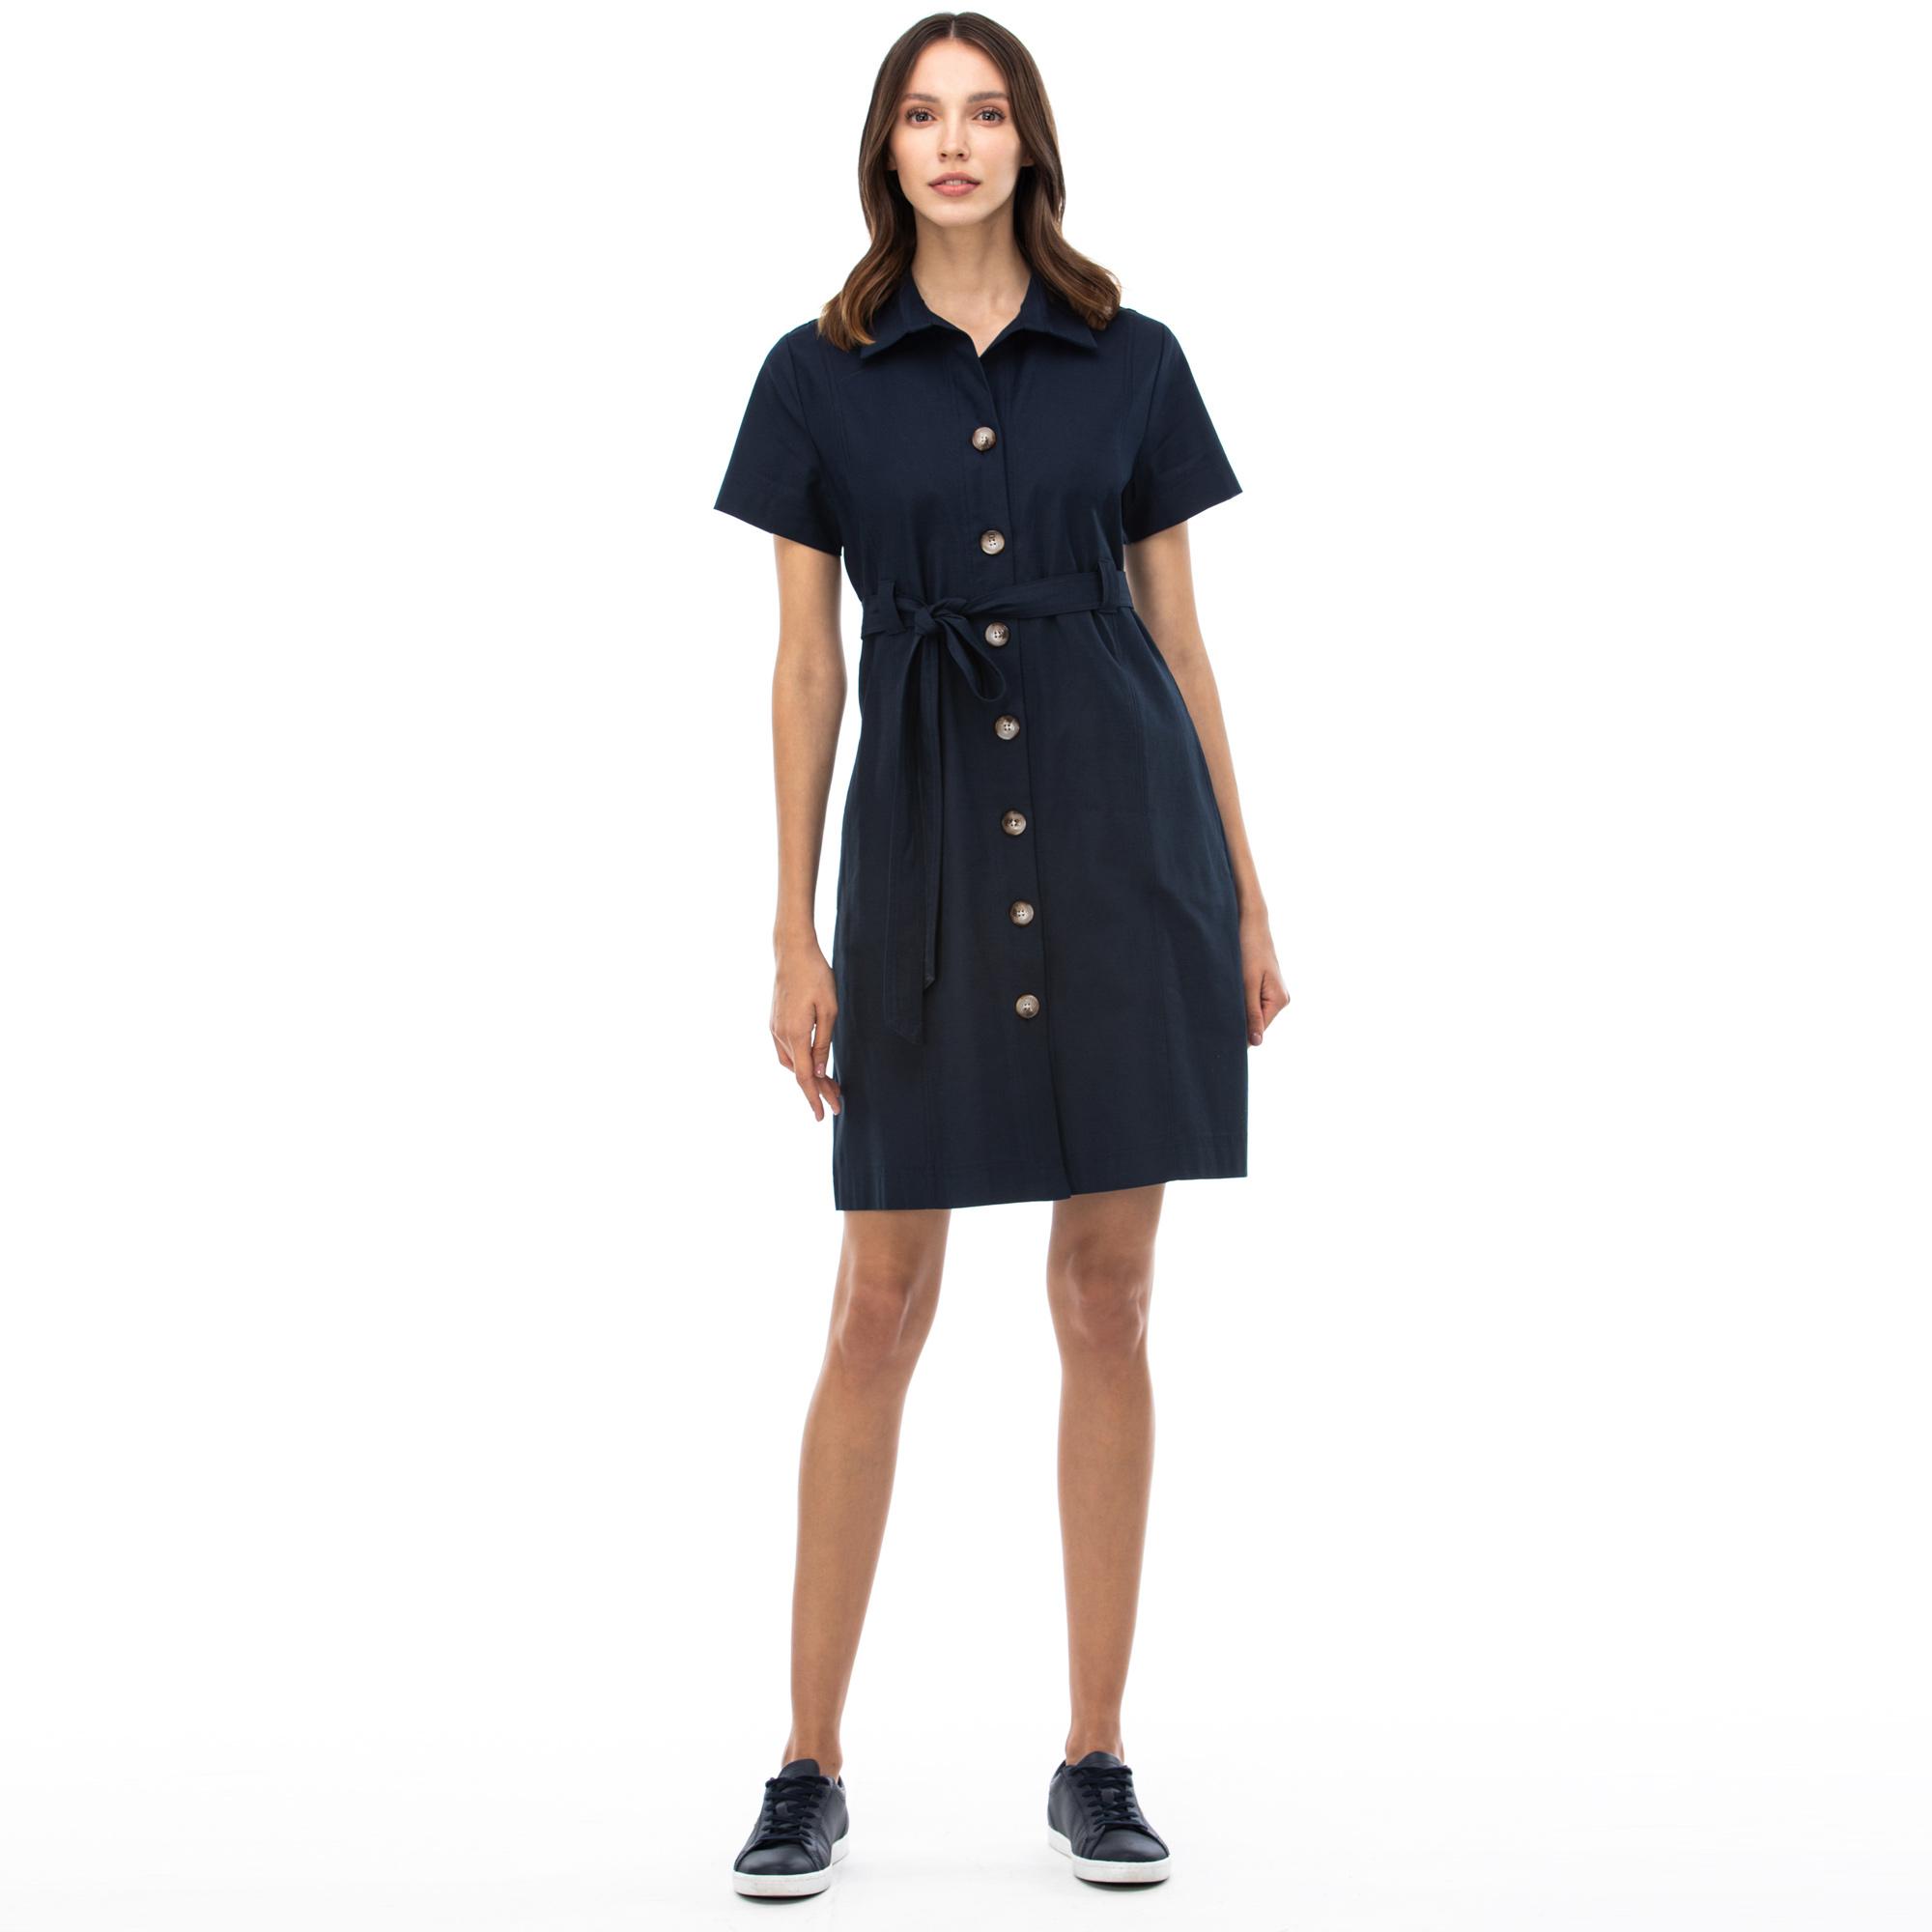 NAUTICA Kadın Lacivert Polo Yaka Elbise